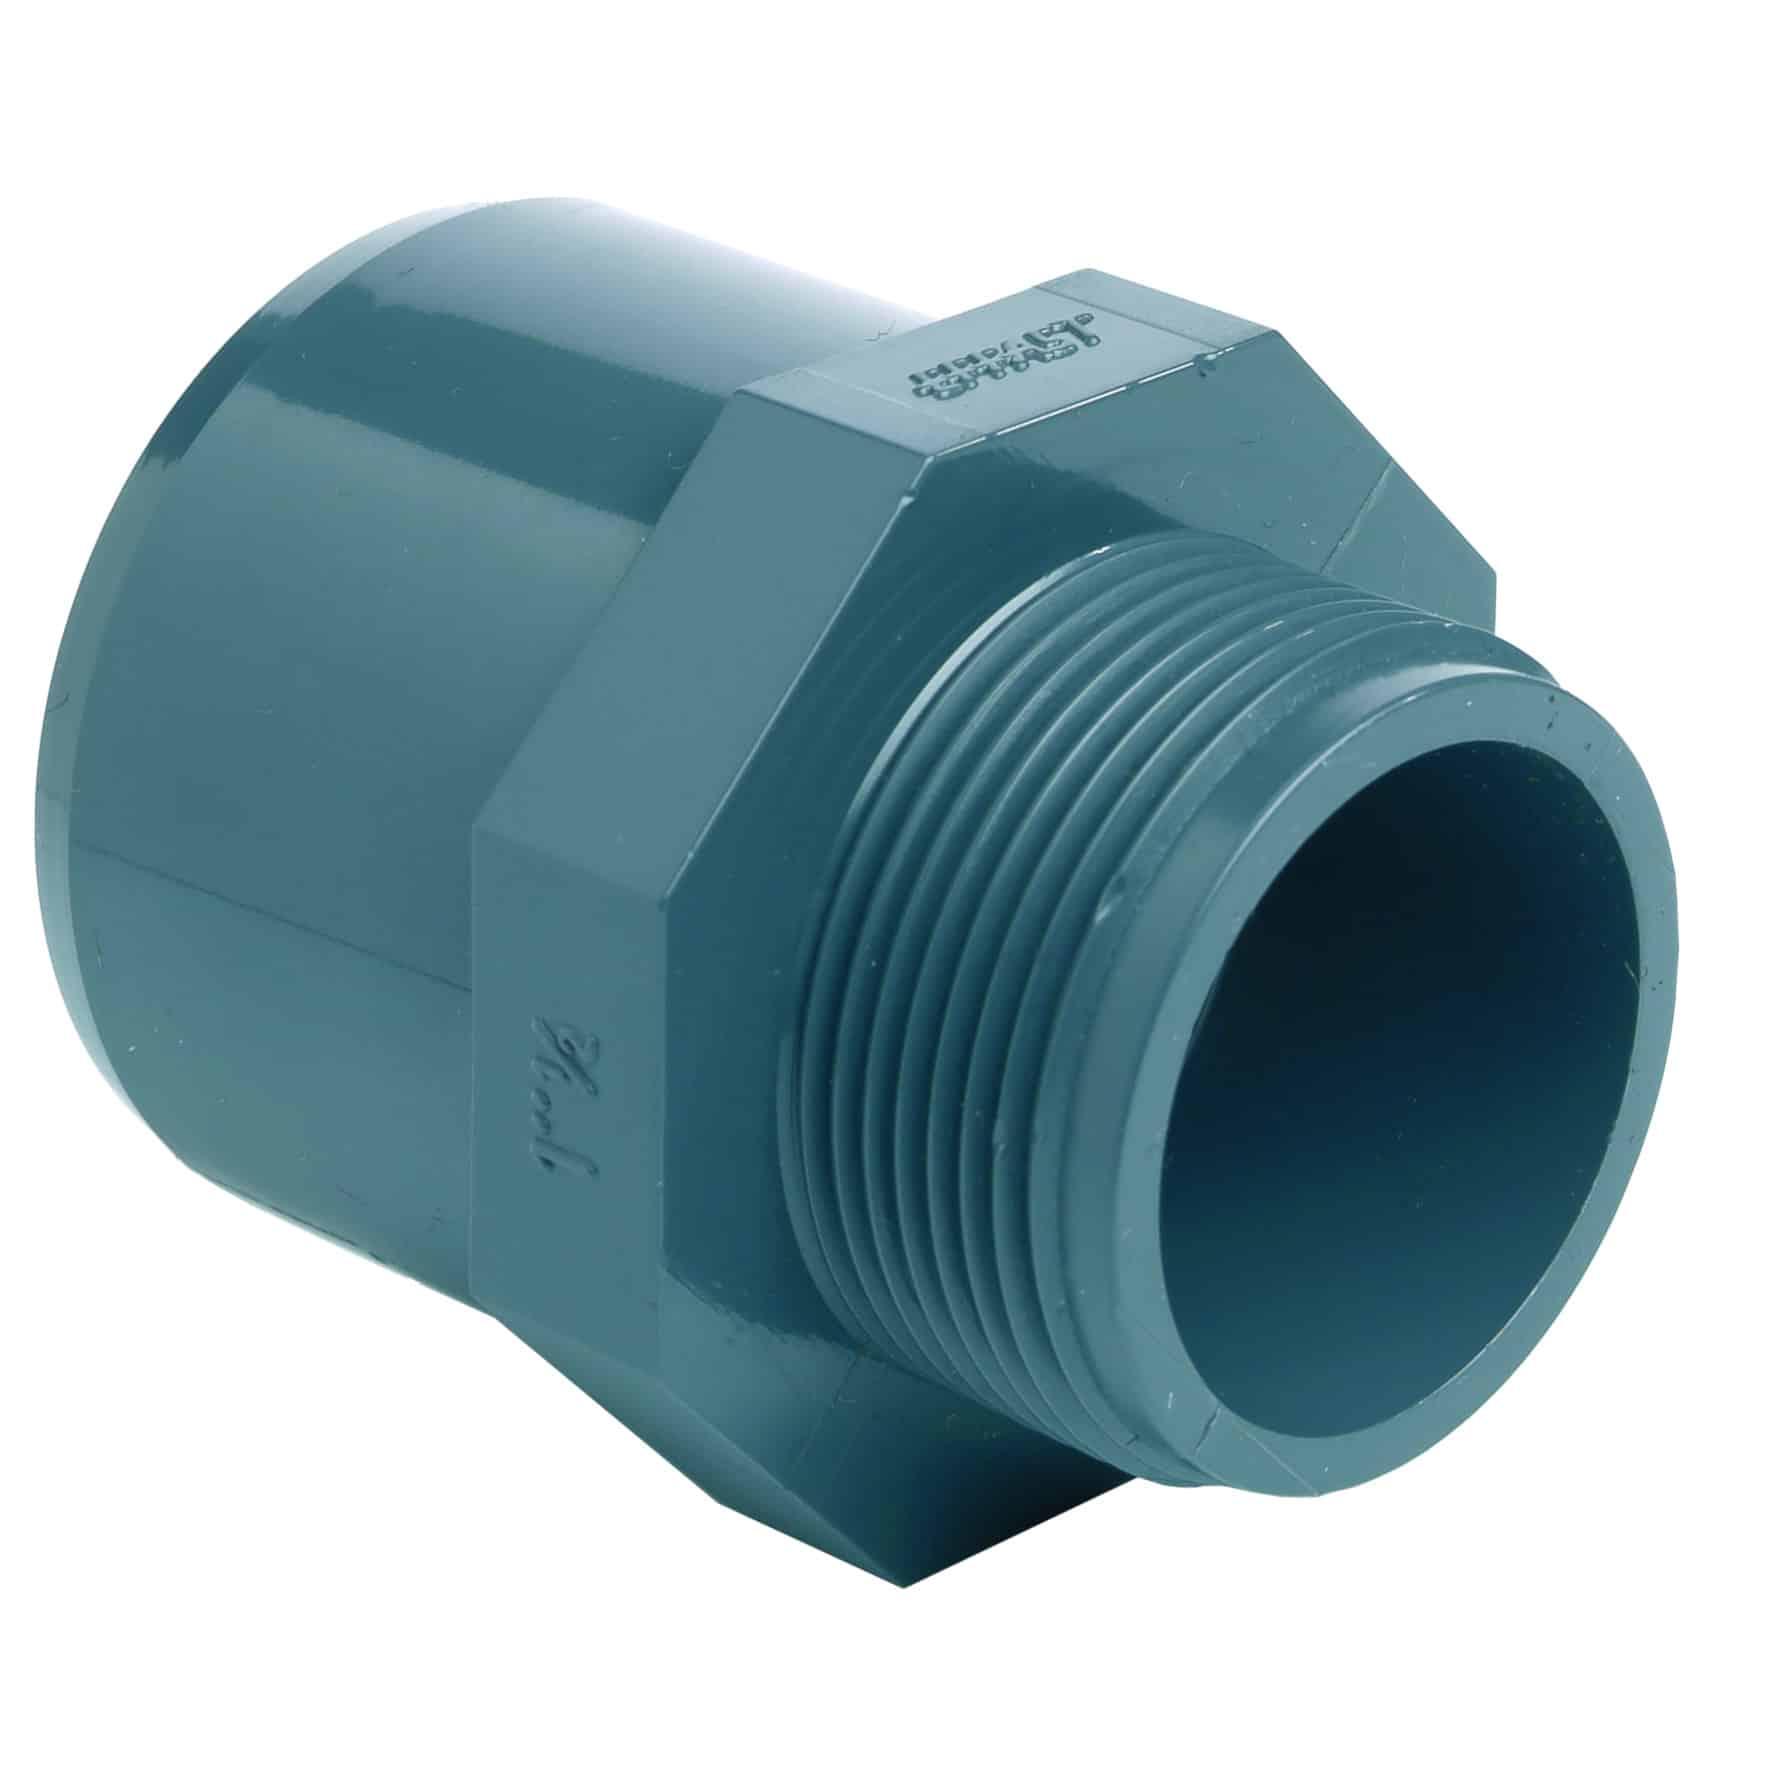 PVC-U male adaptor - EFFAST - 100% Made in Italy